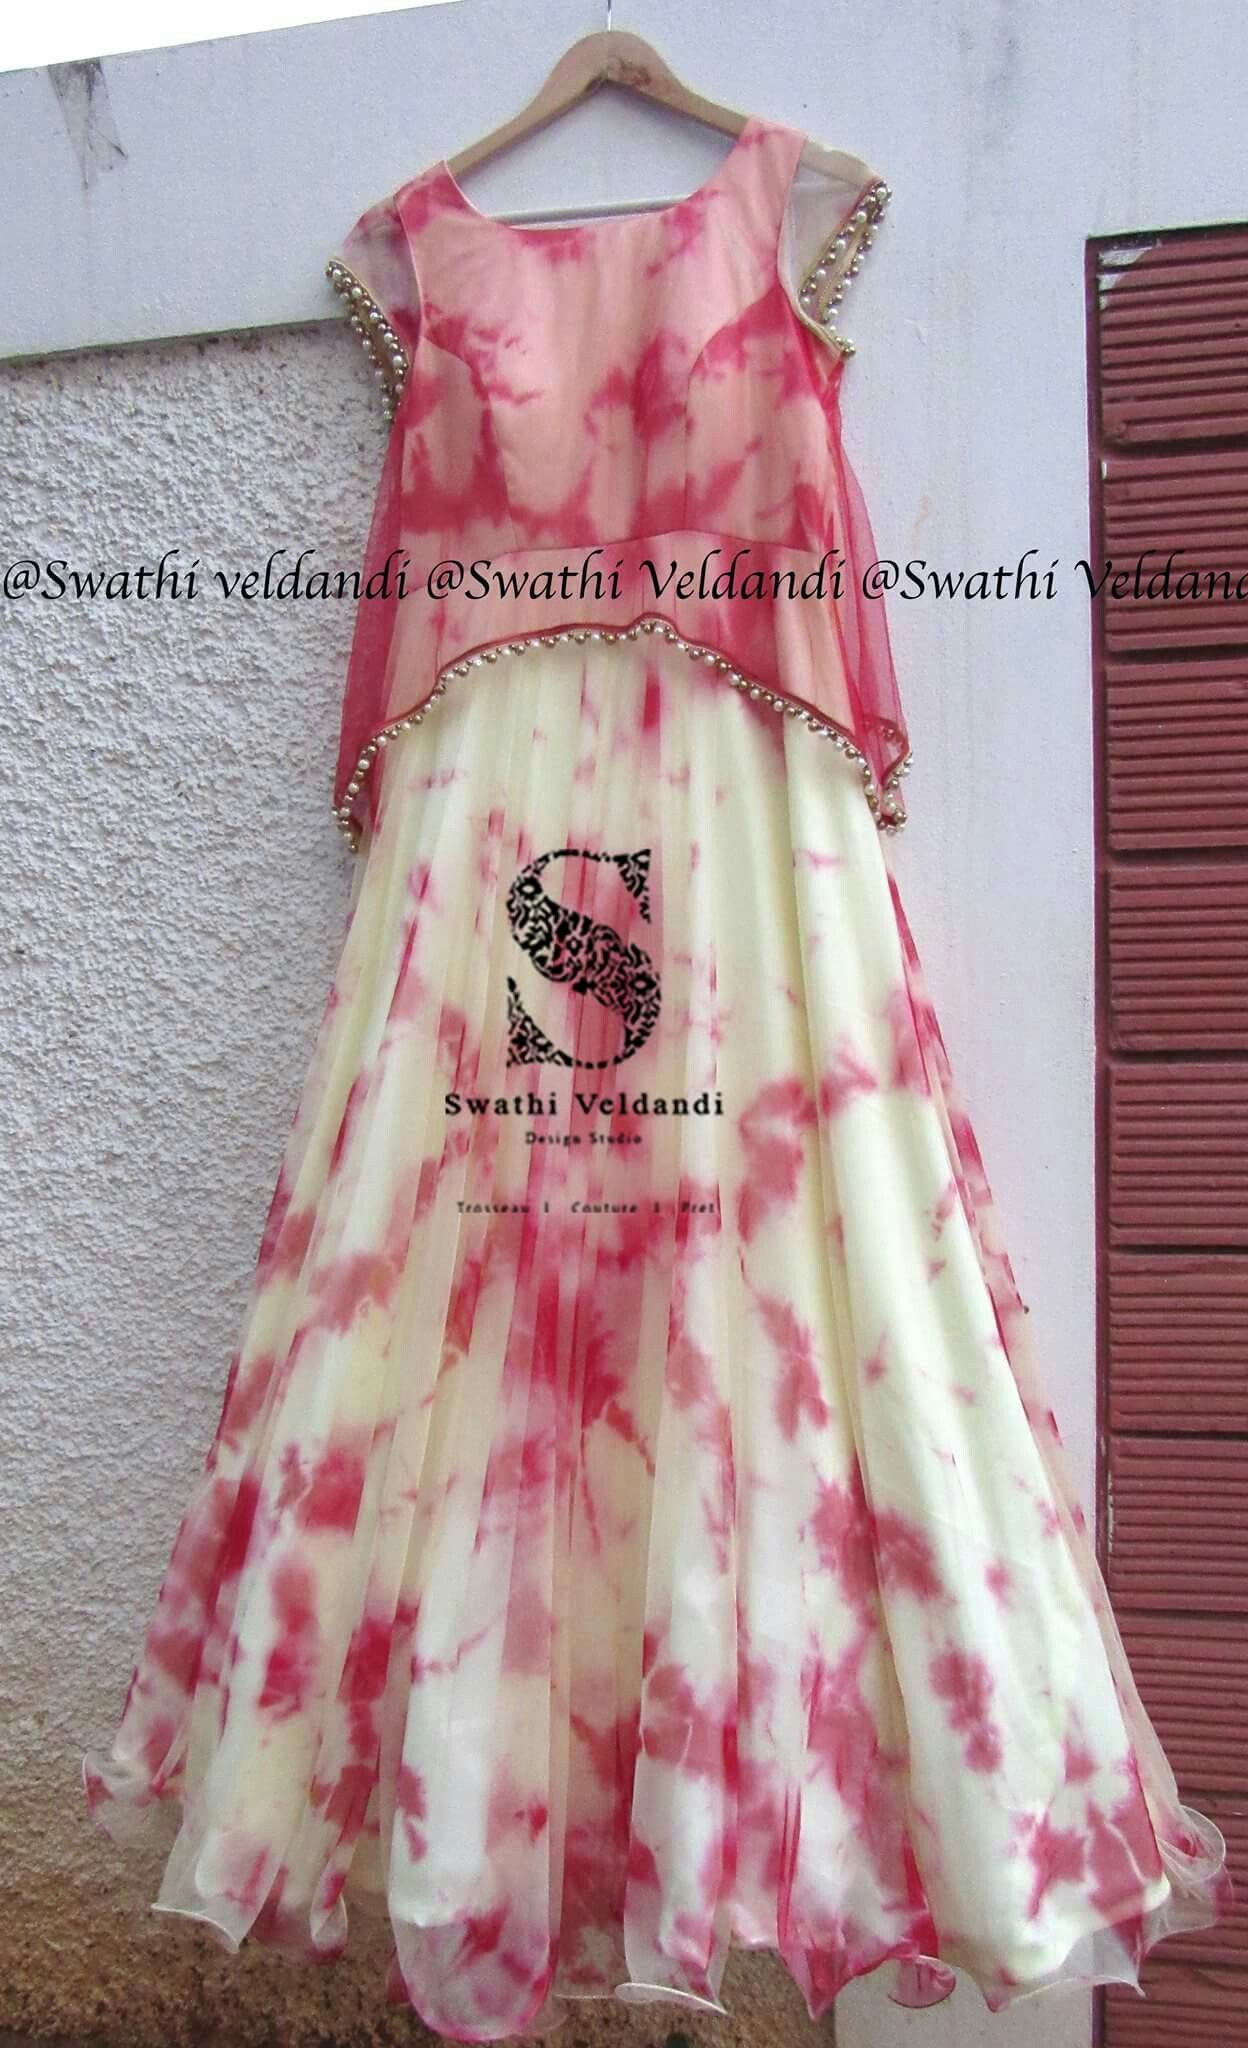 yasevych | styles | Pinterest | Pintura en tela, Vestidos de talla ...